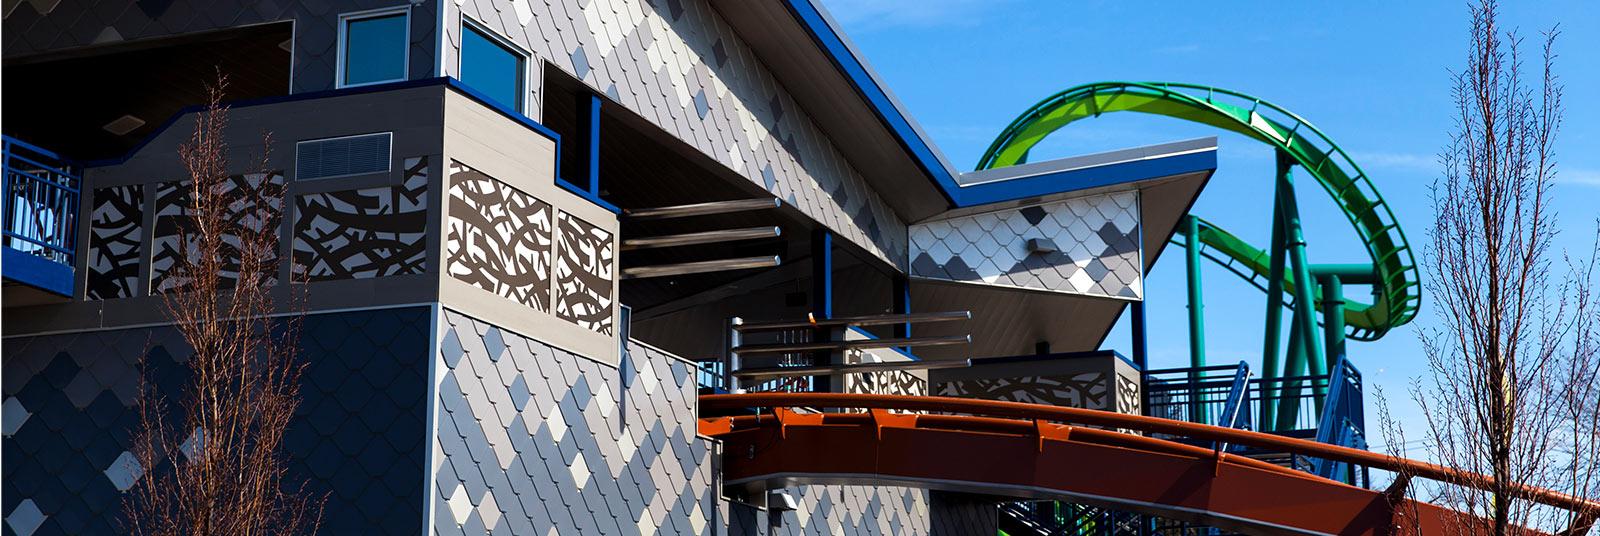 Cedar Point Valravn Coaster Station Sandusky Ohio Theme Park